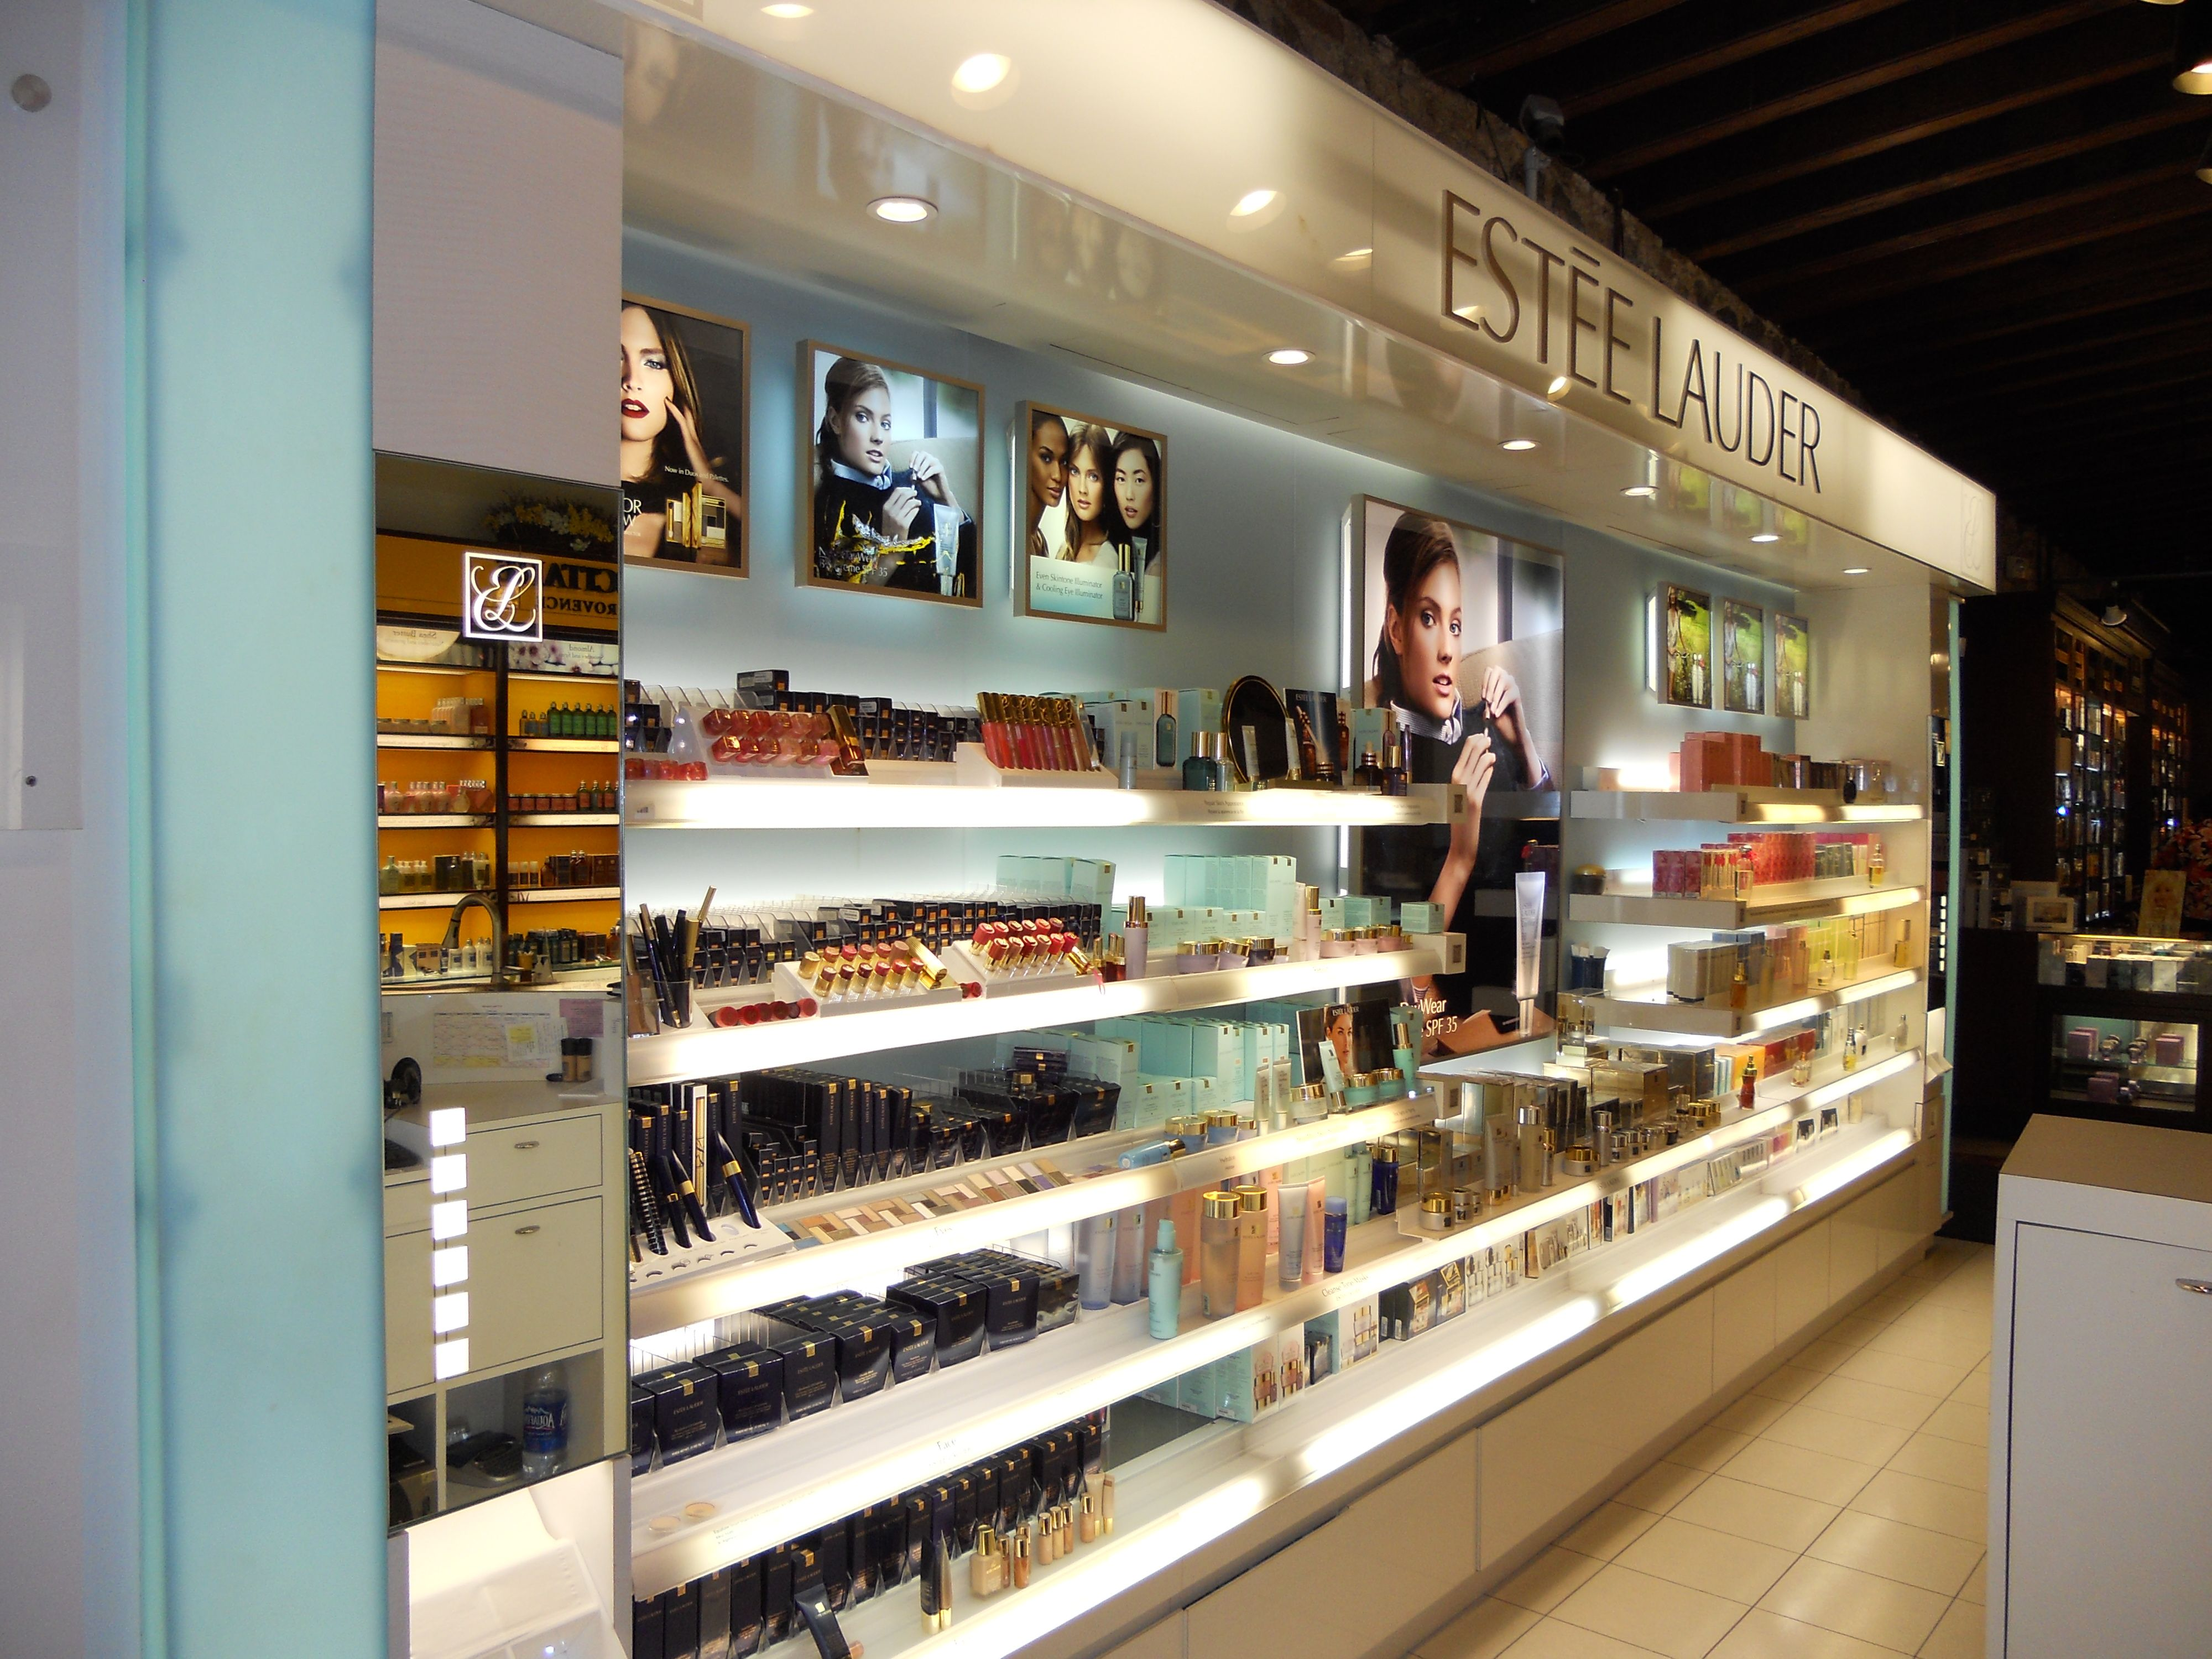 The new Estee Lauder cosmetics Cosmetics